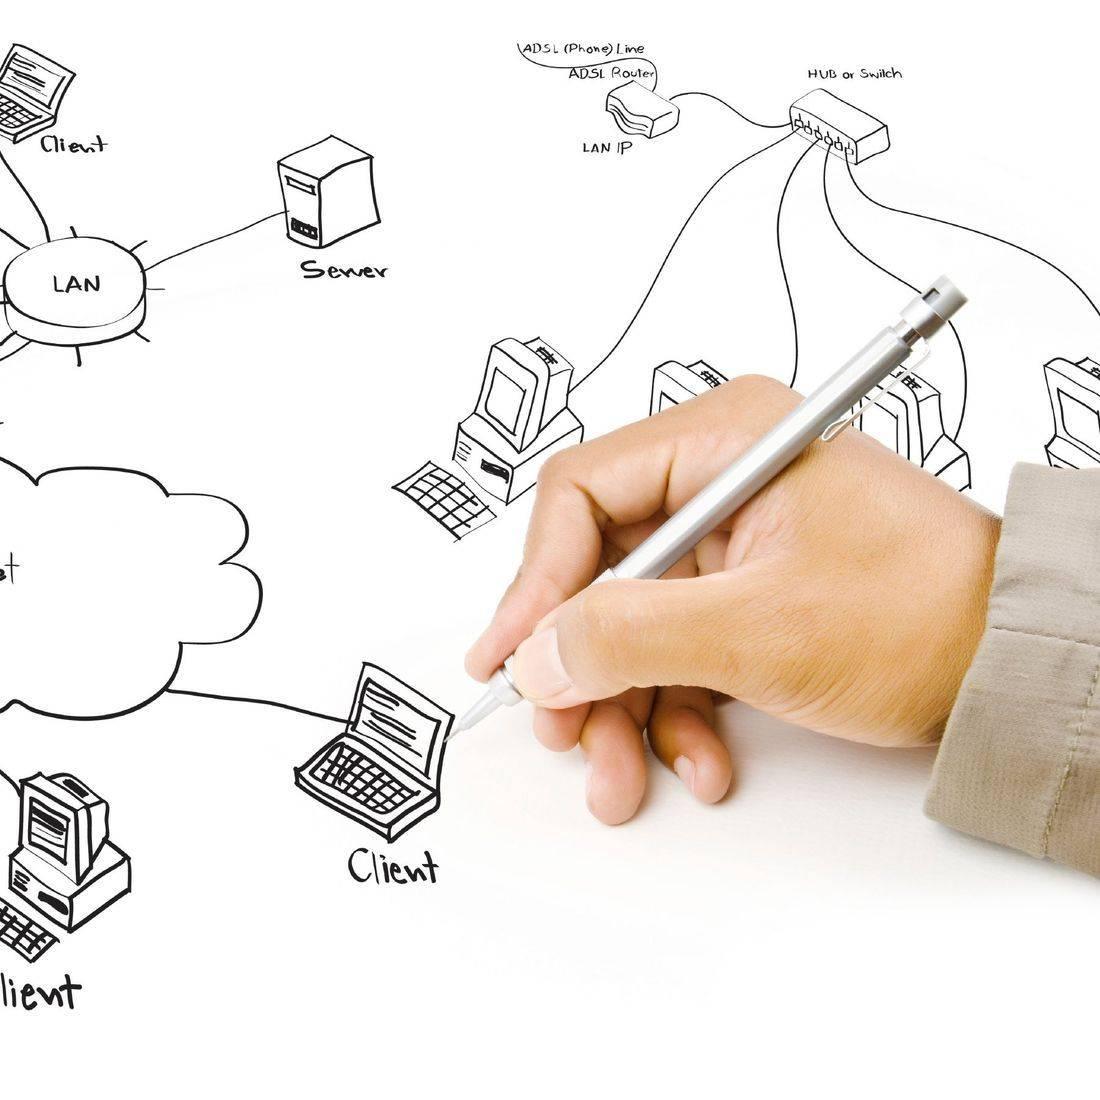 cctv system design